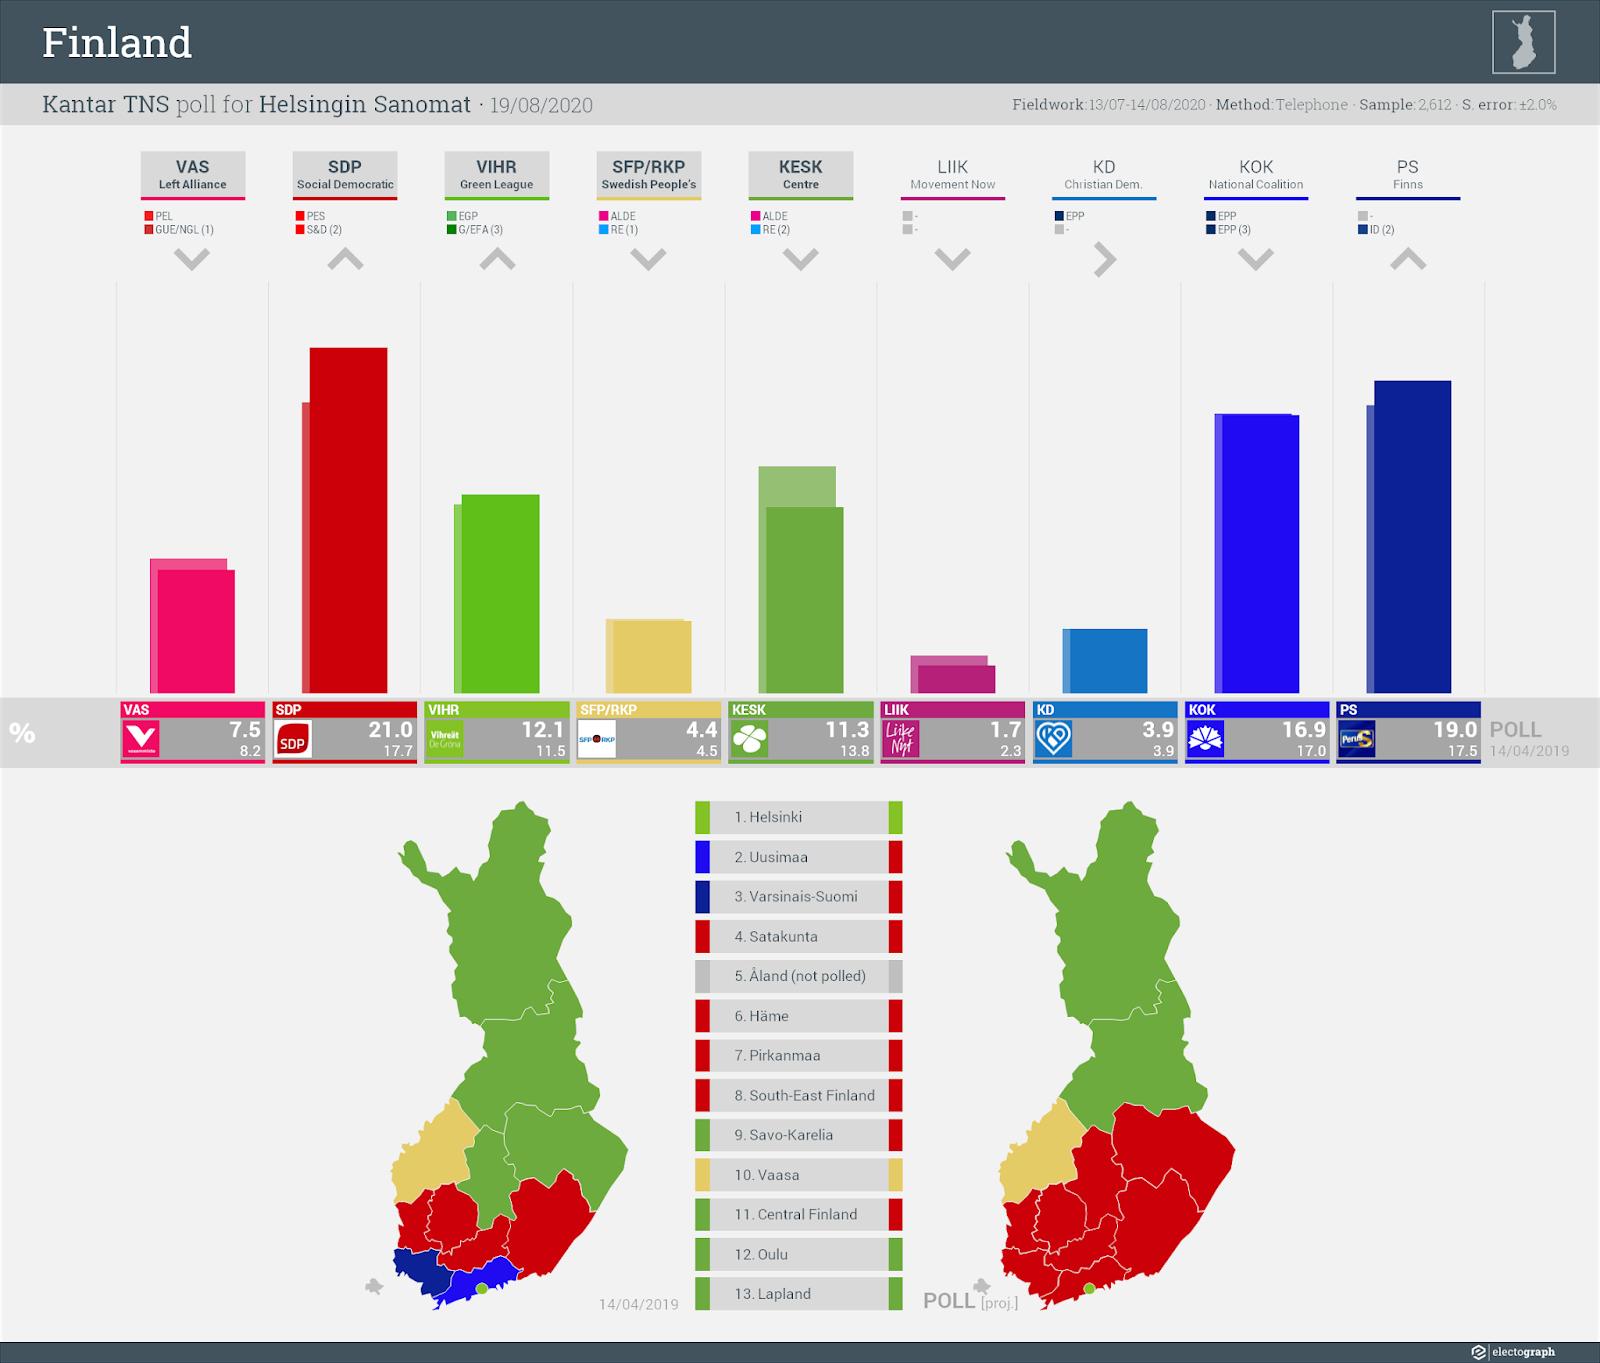 FINLAND: Kantar TNS poll chart for Helsingin Sanomat, 19 August 2020